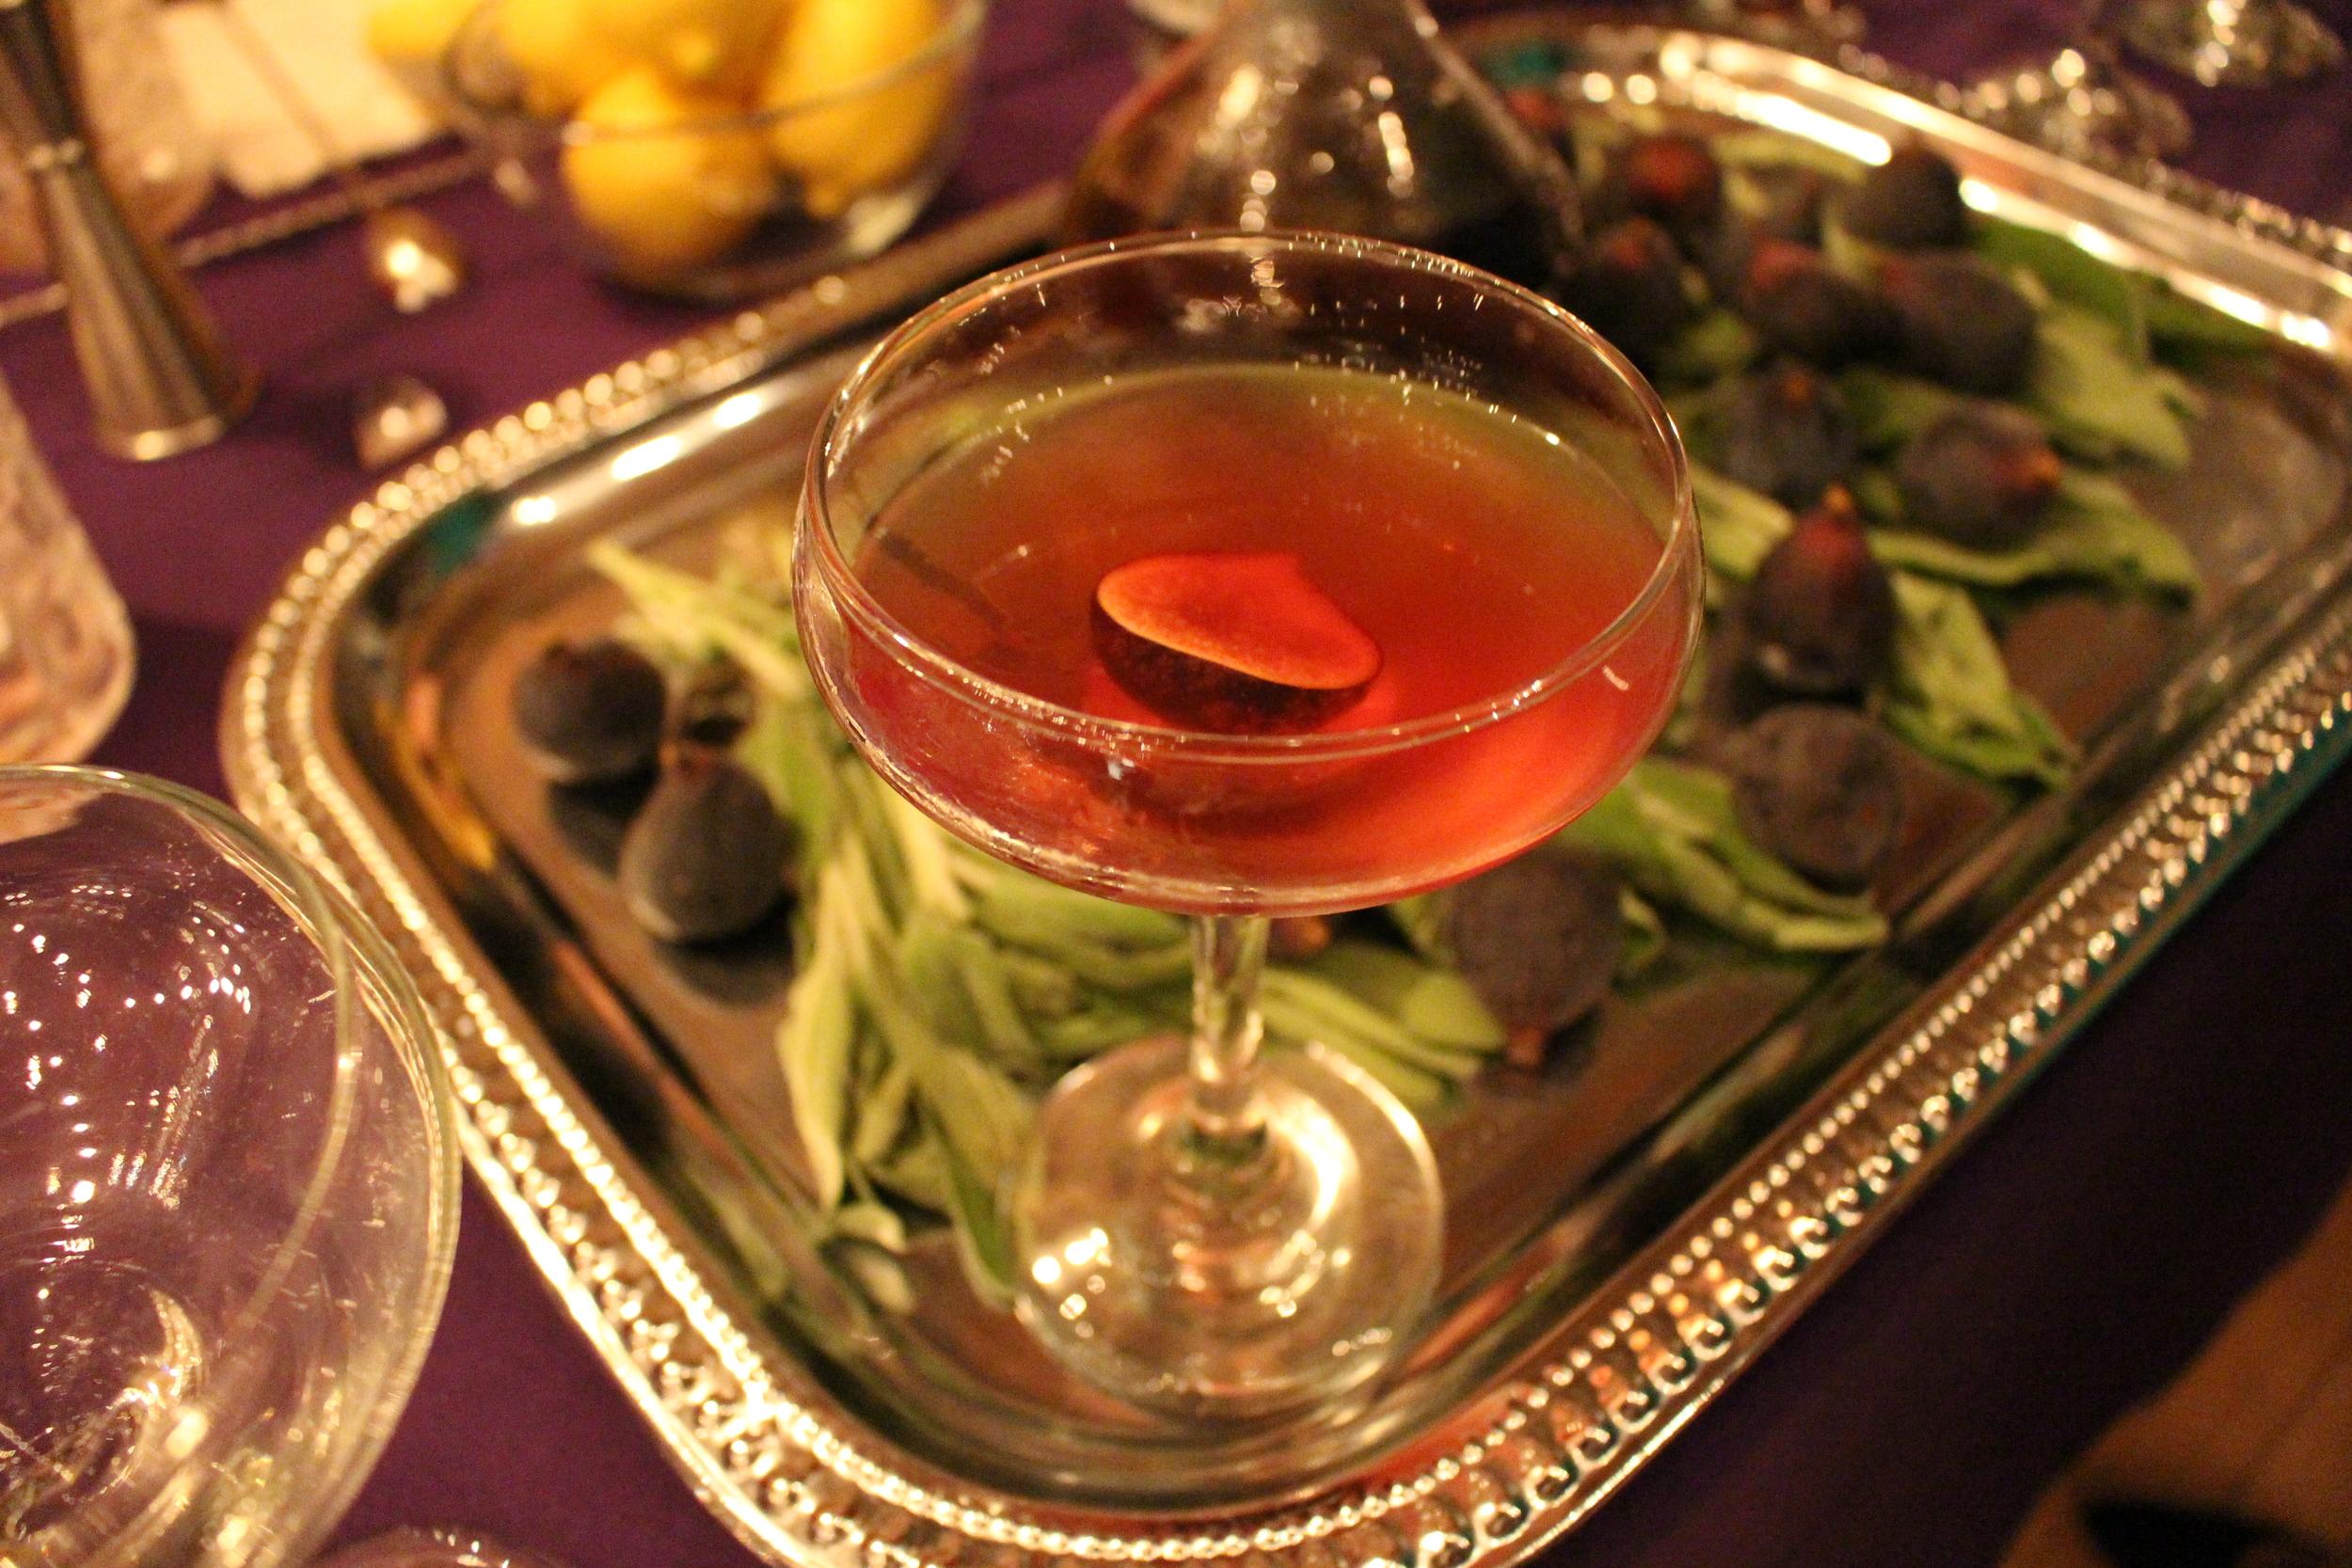 Beautiful Figgy Cocktail By Gina Chersevani of Buffalo and Bergen